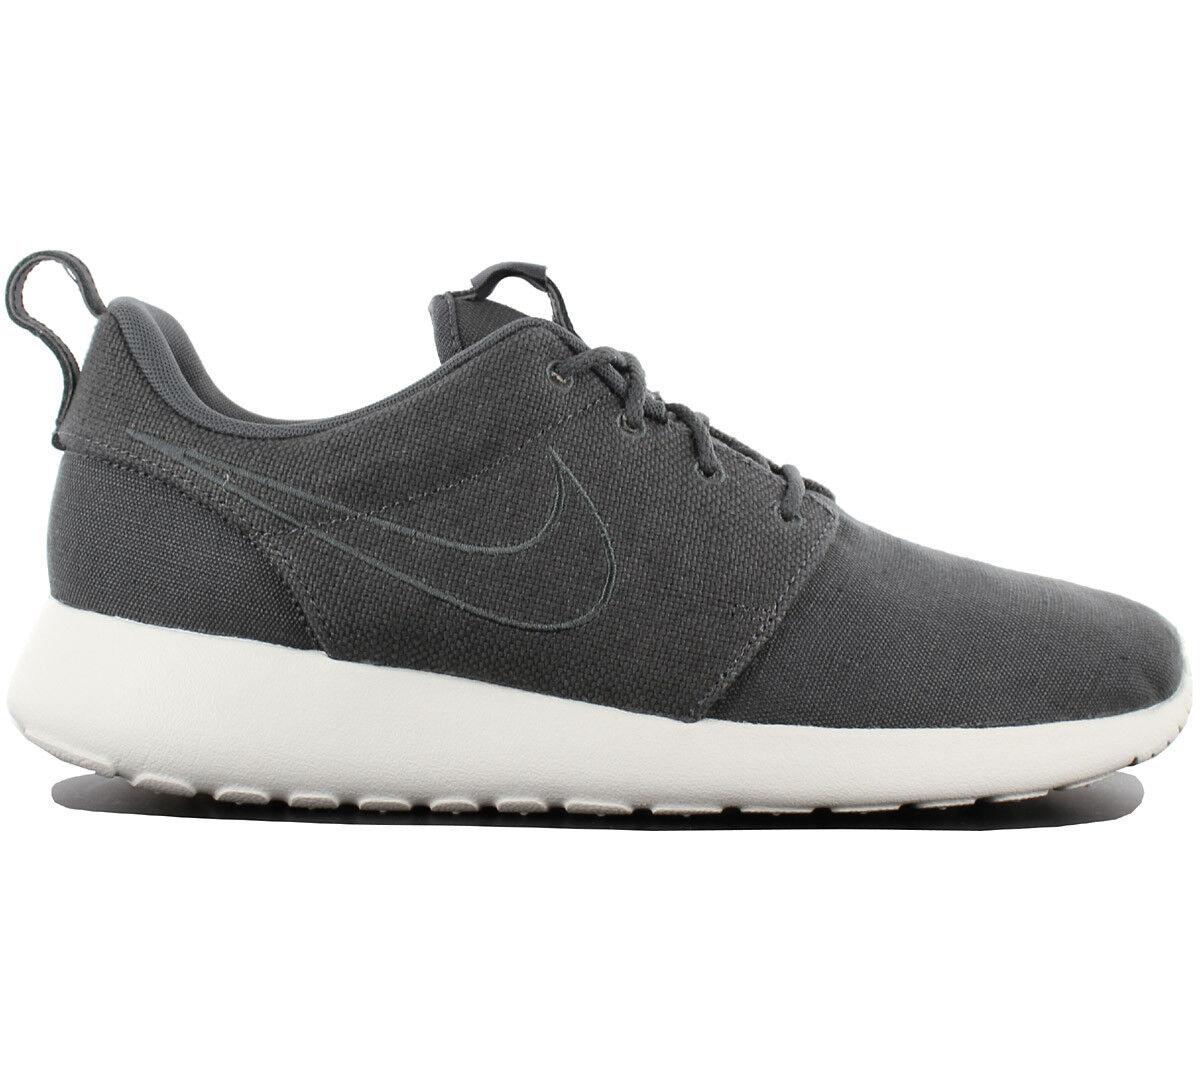 Nike Roshe One Premium Herren Turnschuhe Schuhe Textil Grau Run Two 525234-012 NEU